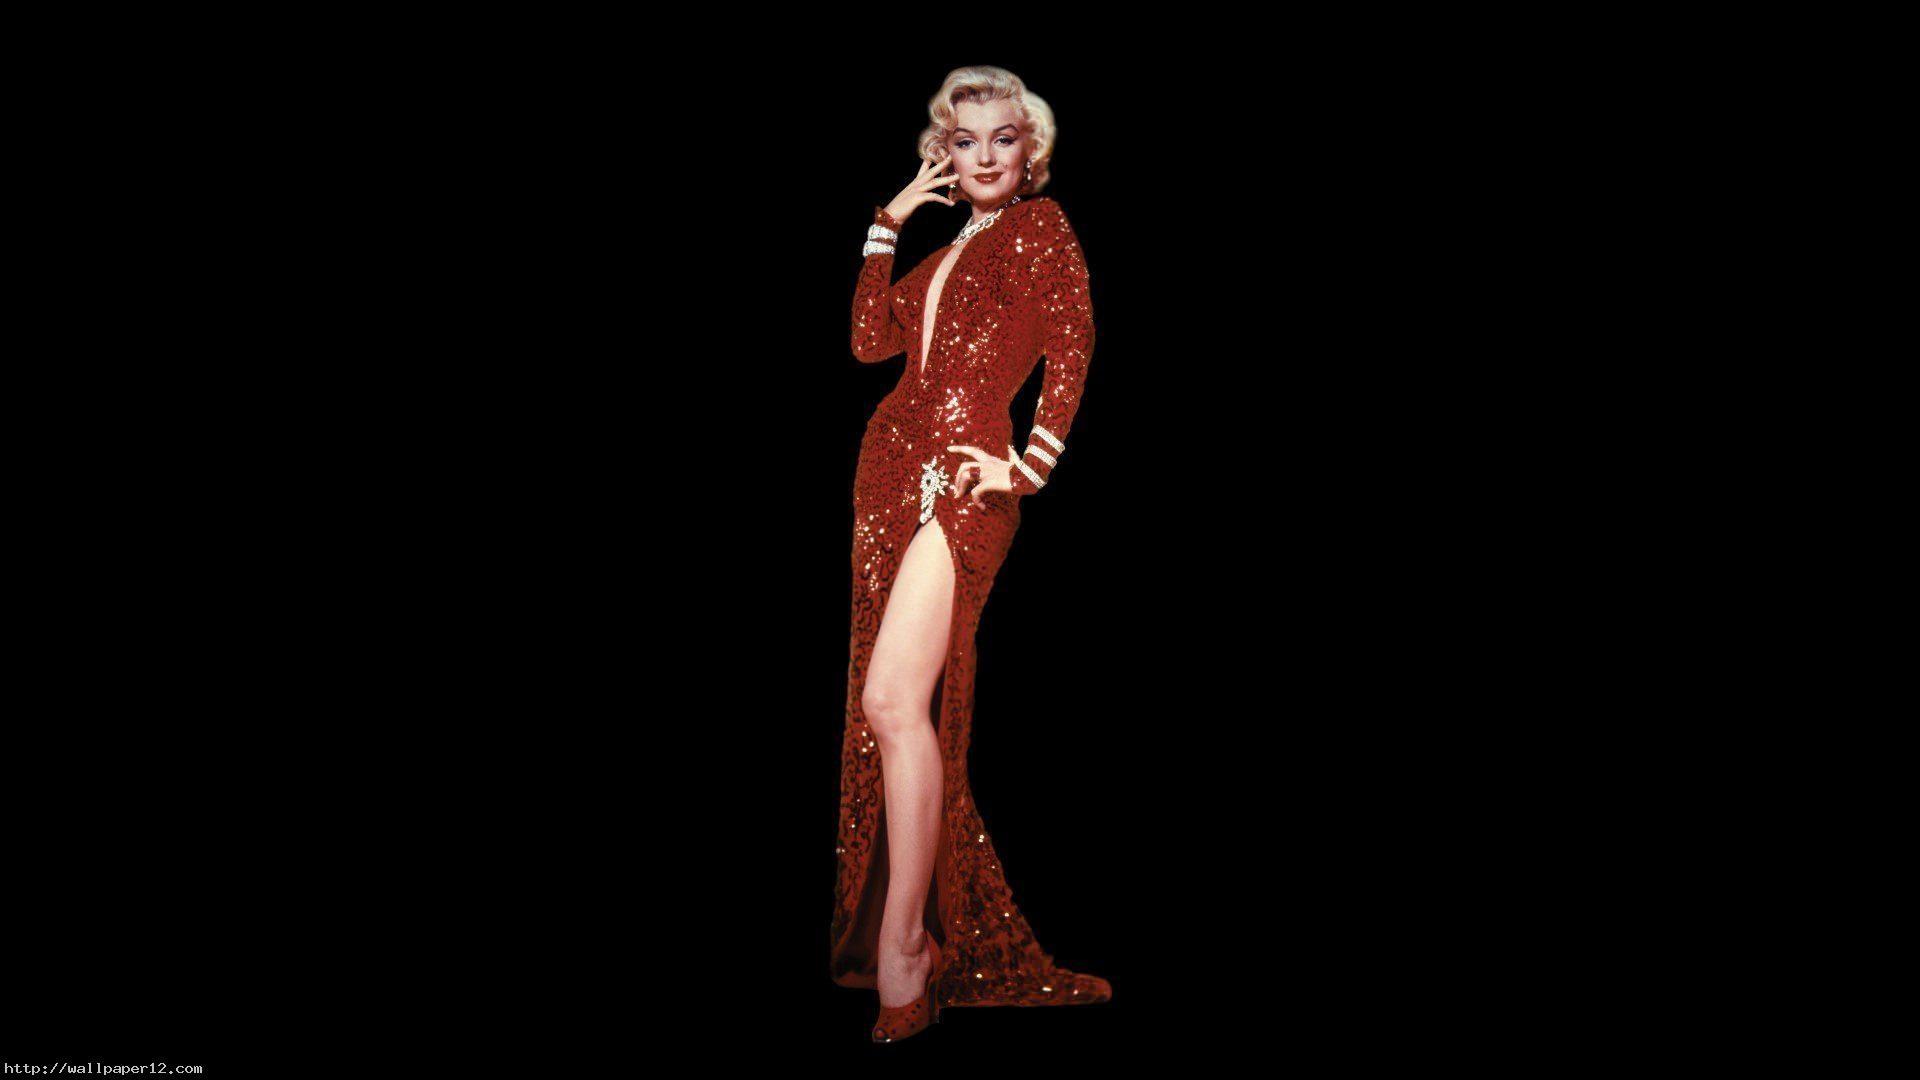 Res: 1920x1080, Marilyn Monroe Wallpaper